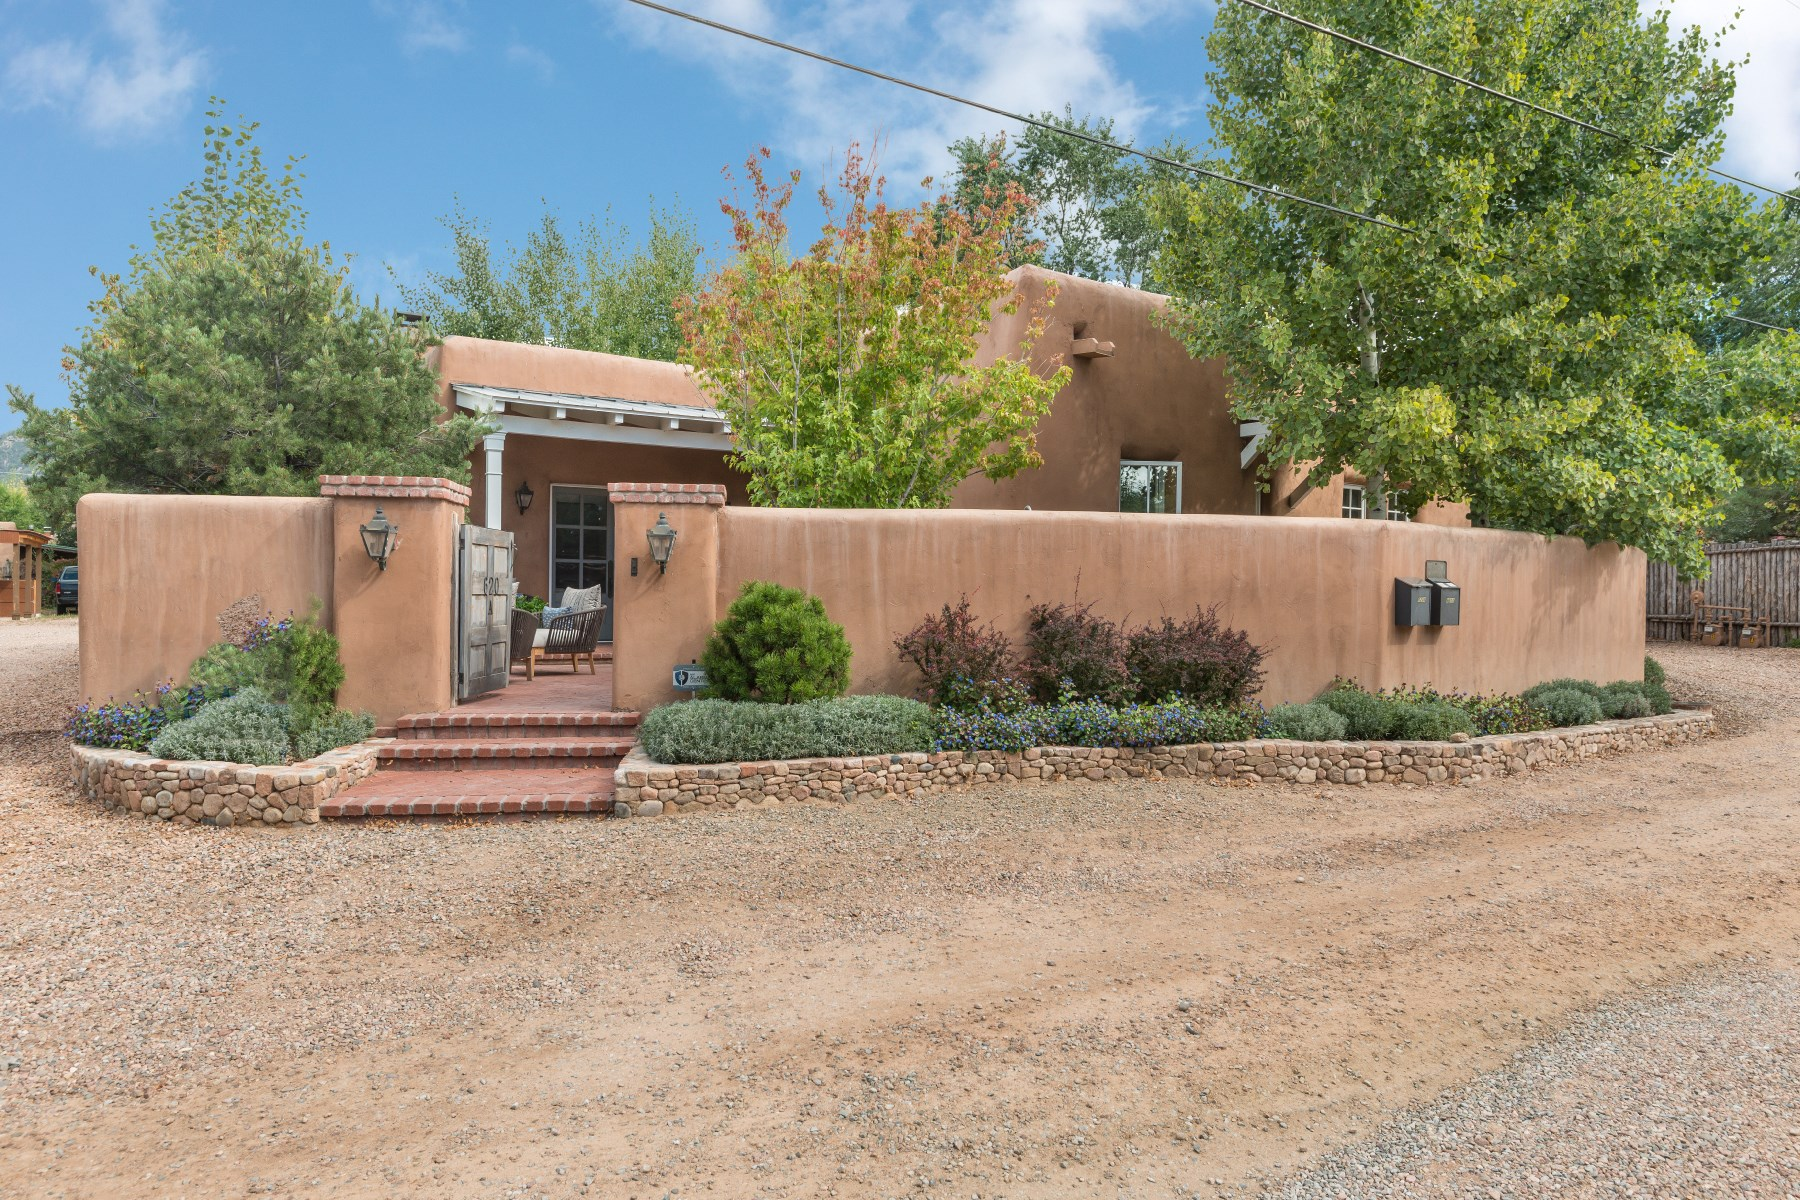 Condominium for Sale at 986-A Acequia Madre 986 Acequia Madre Unit A Santa Fe City Southeast, Santa Fe, New Mexico, 87505 United States